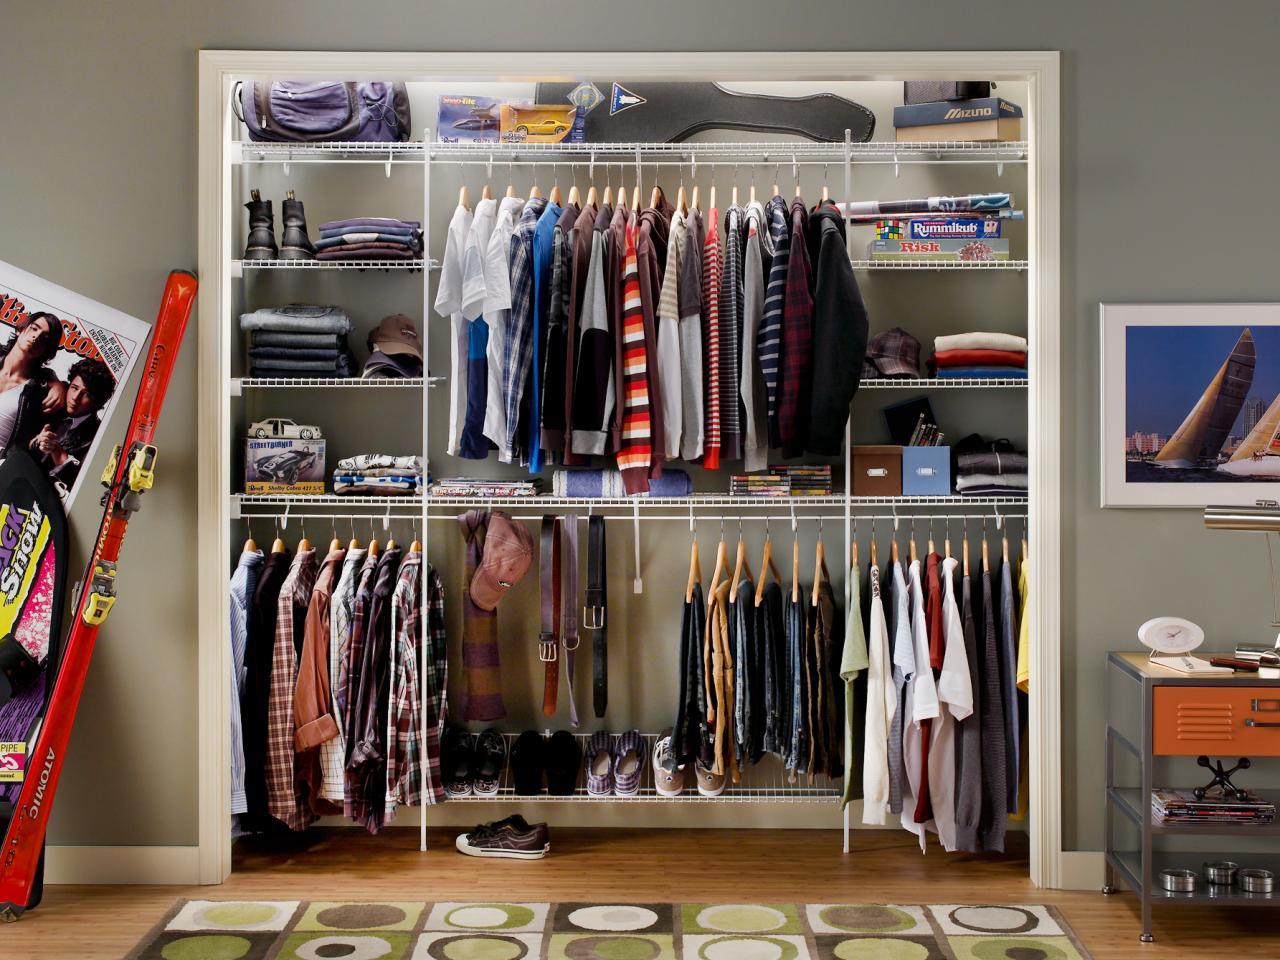 closet ideas for small rooms - Small Closet Organization Ideas Options & Tips